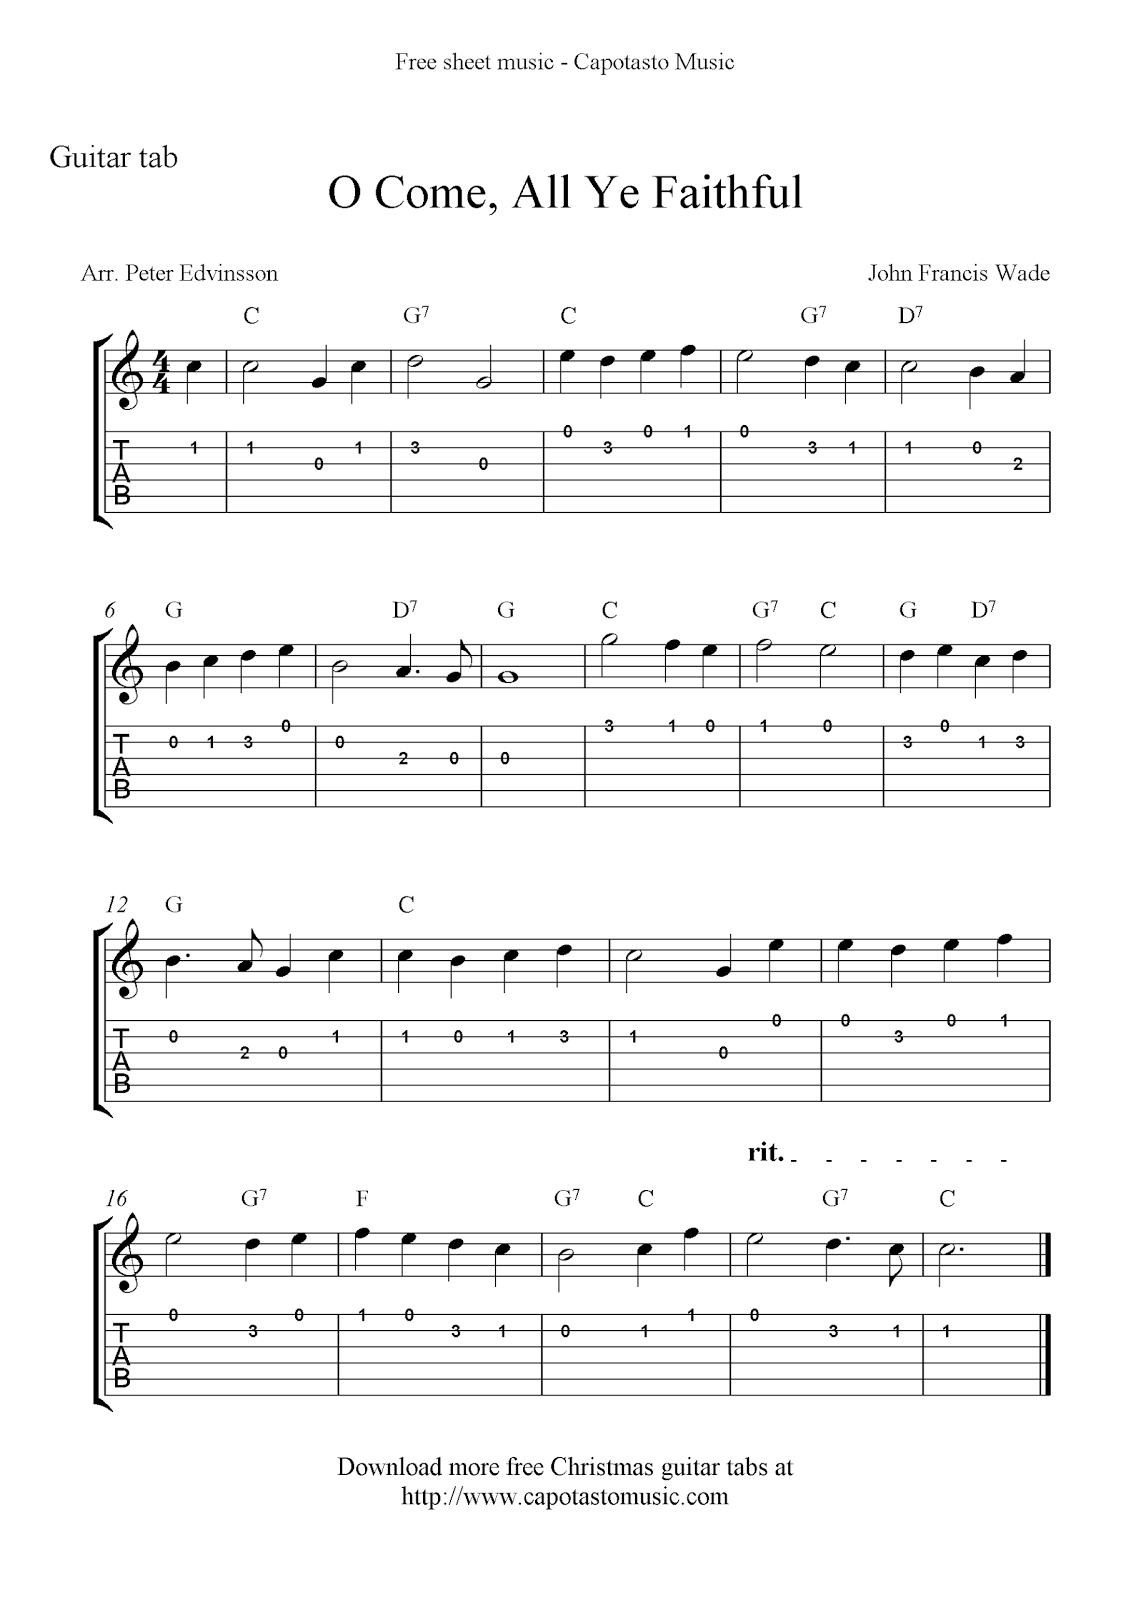 Free Printable Sheet Music: O Come, All Ye Faithful, Easy Free - Free Guitar Sheet Music For Popular Songs Printable